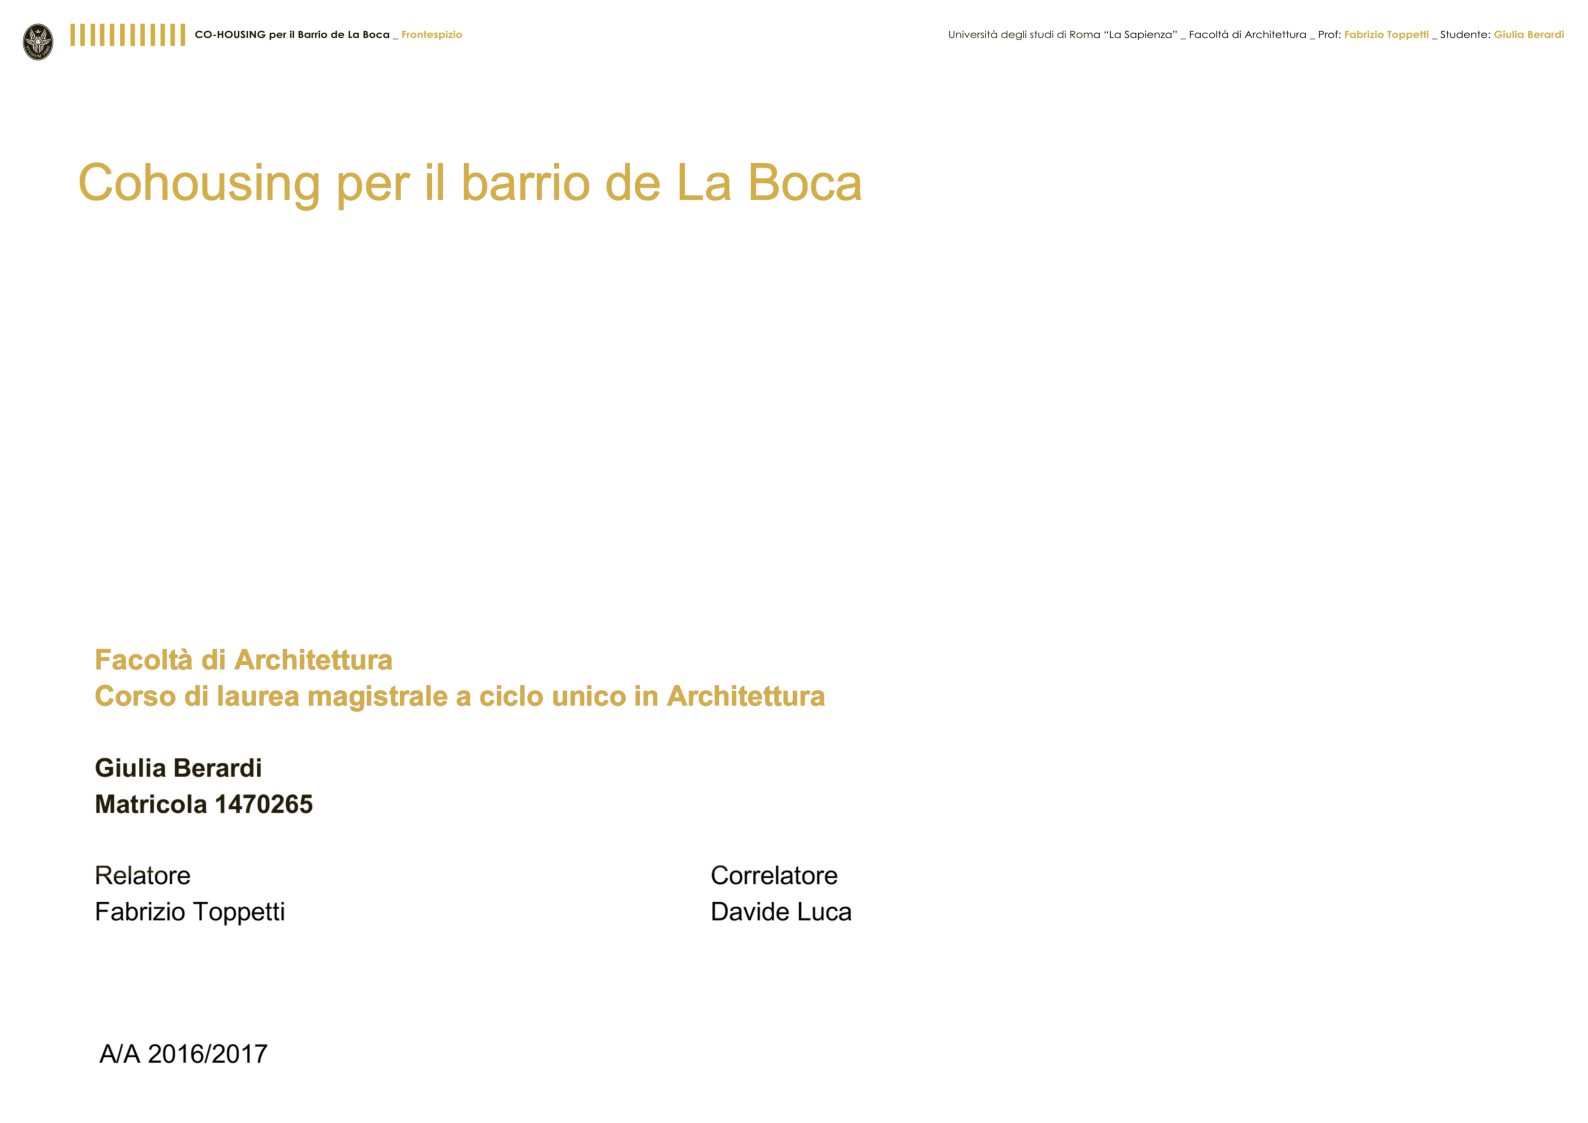 Anteprima della tesi: Cohousing per il barrio de La Boca - Buenos Aires, Pagina 1